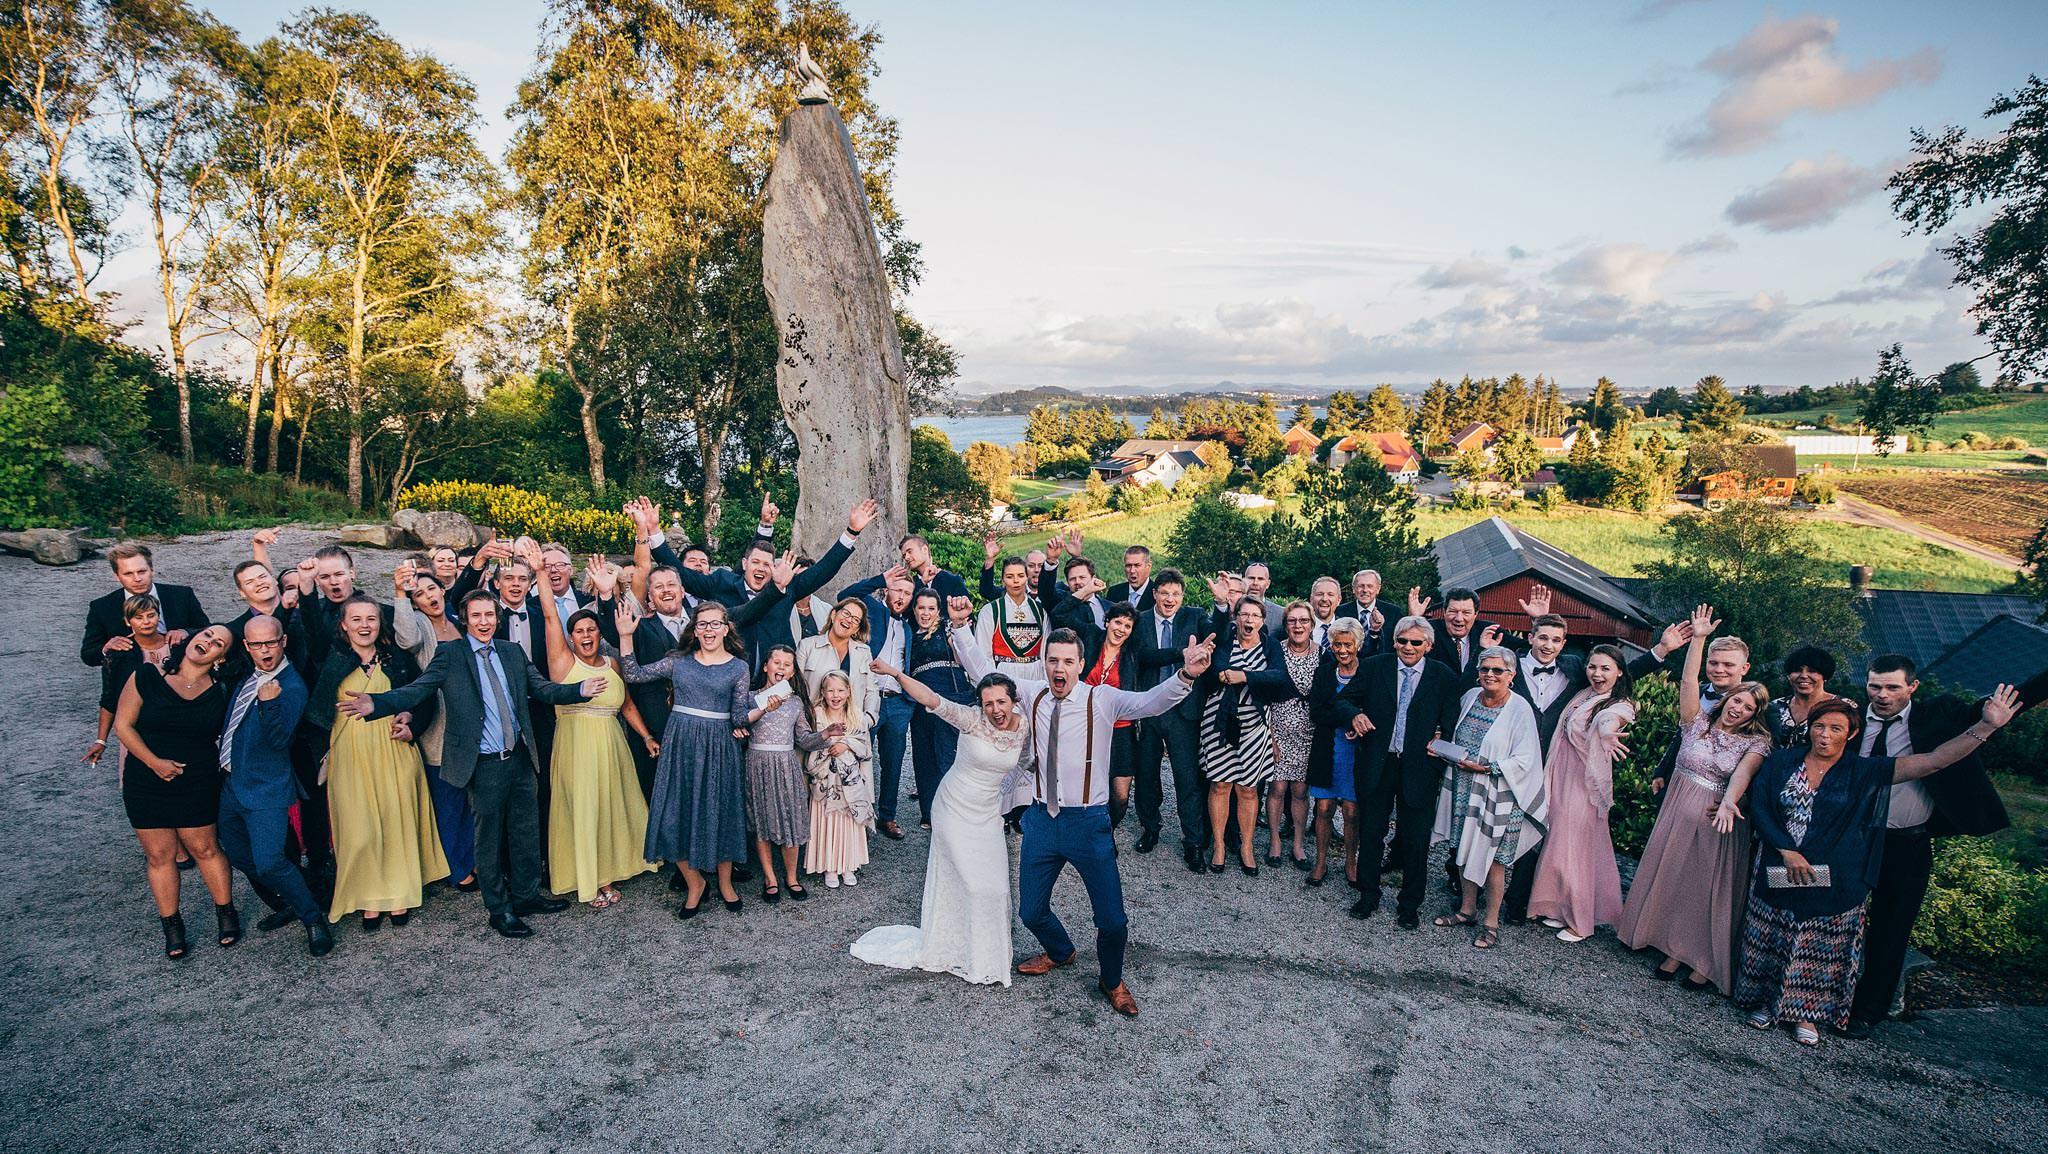 Norway+wedding+photographer+elopement+pre+wedding+Casey+Arneson-121.jpg